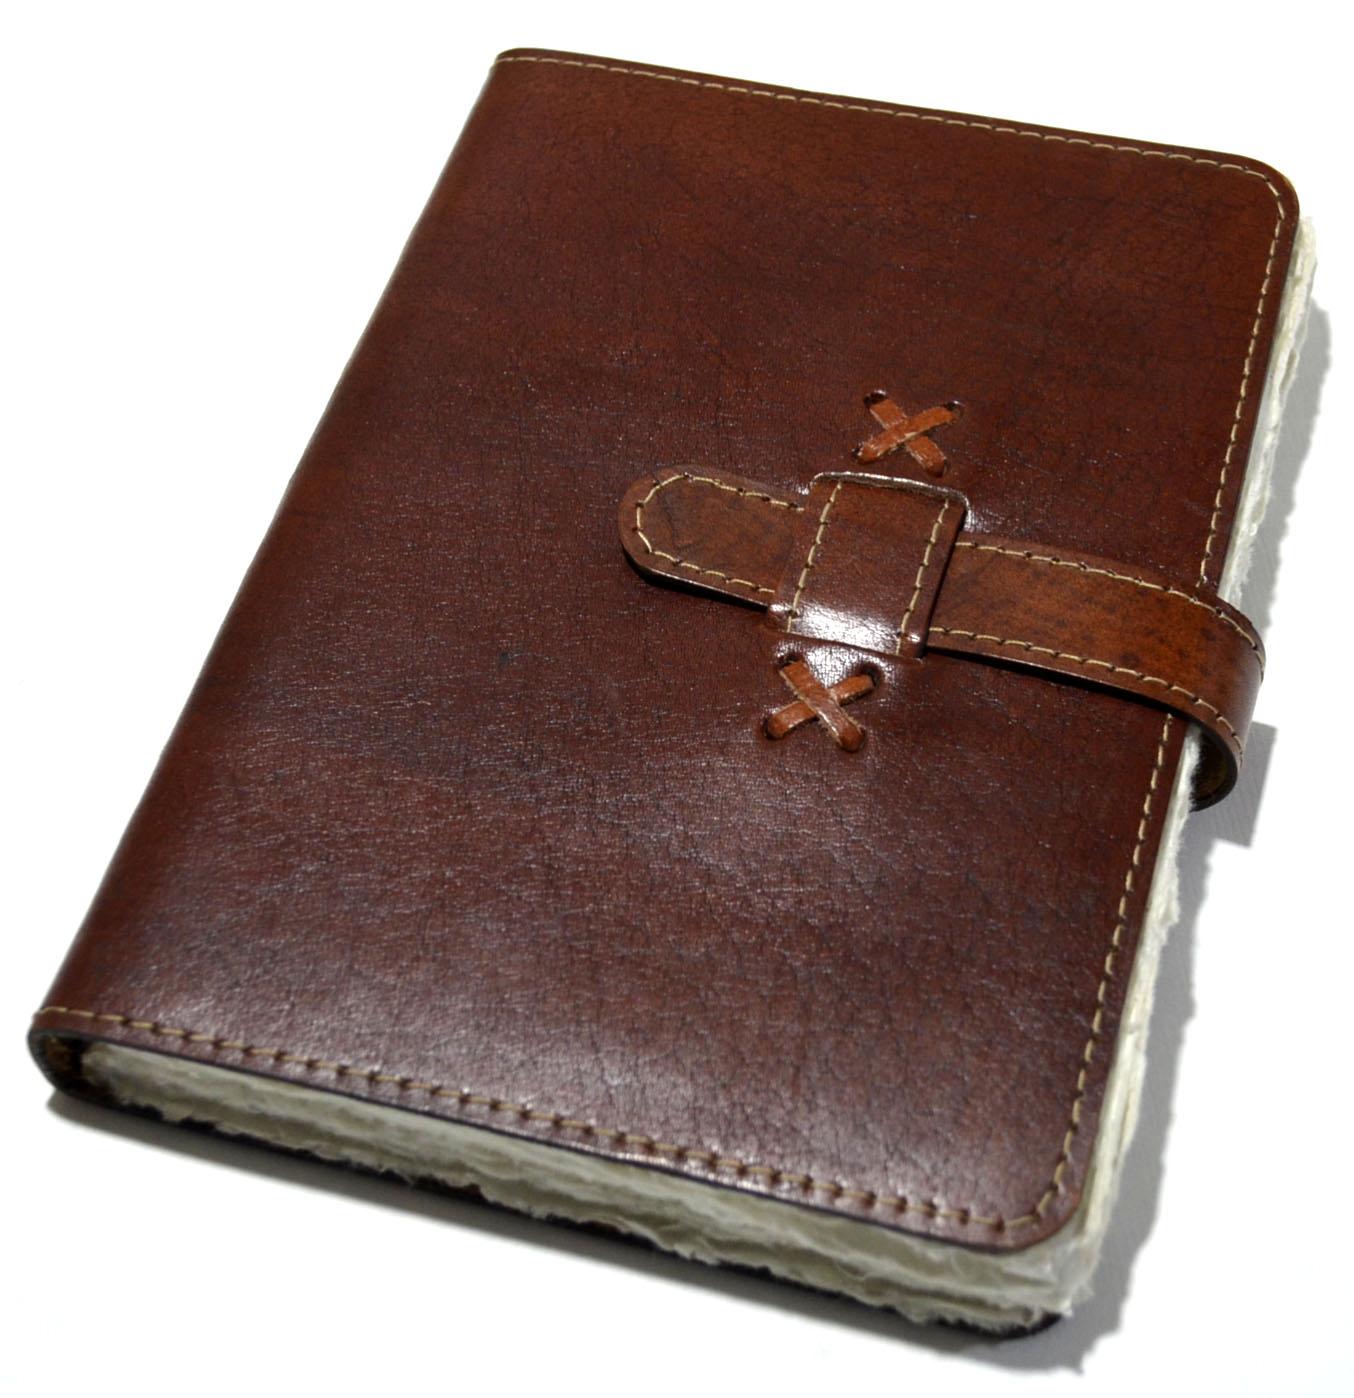 Leather Bound Notebo